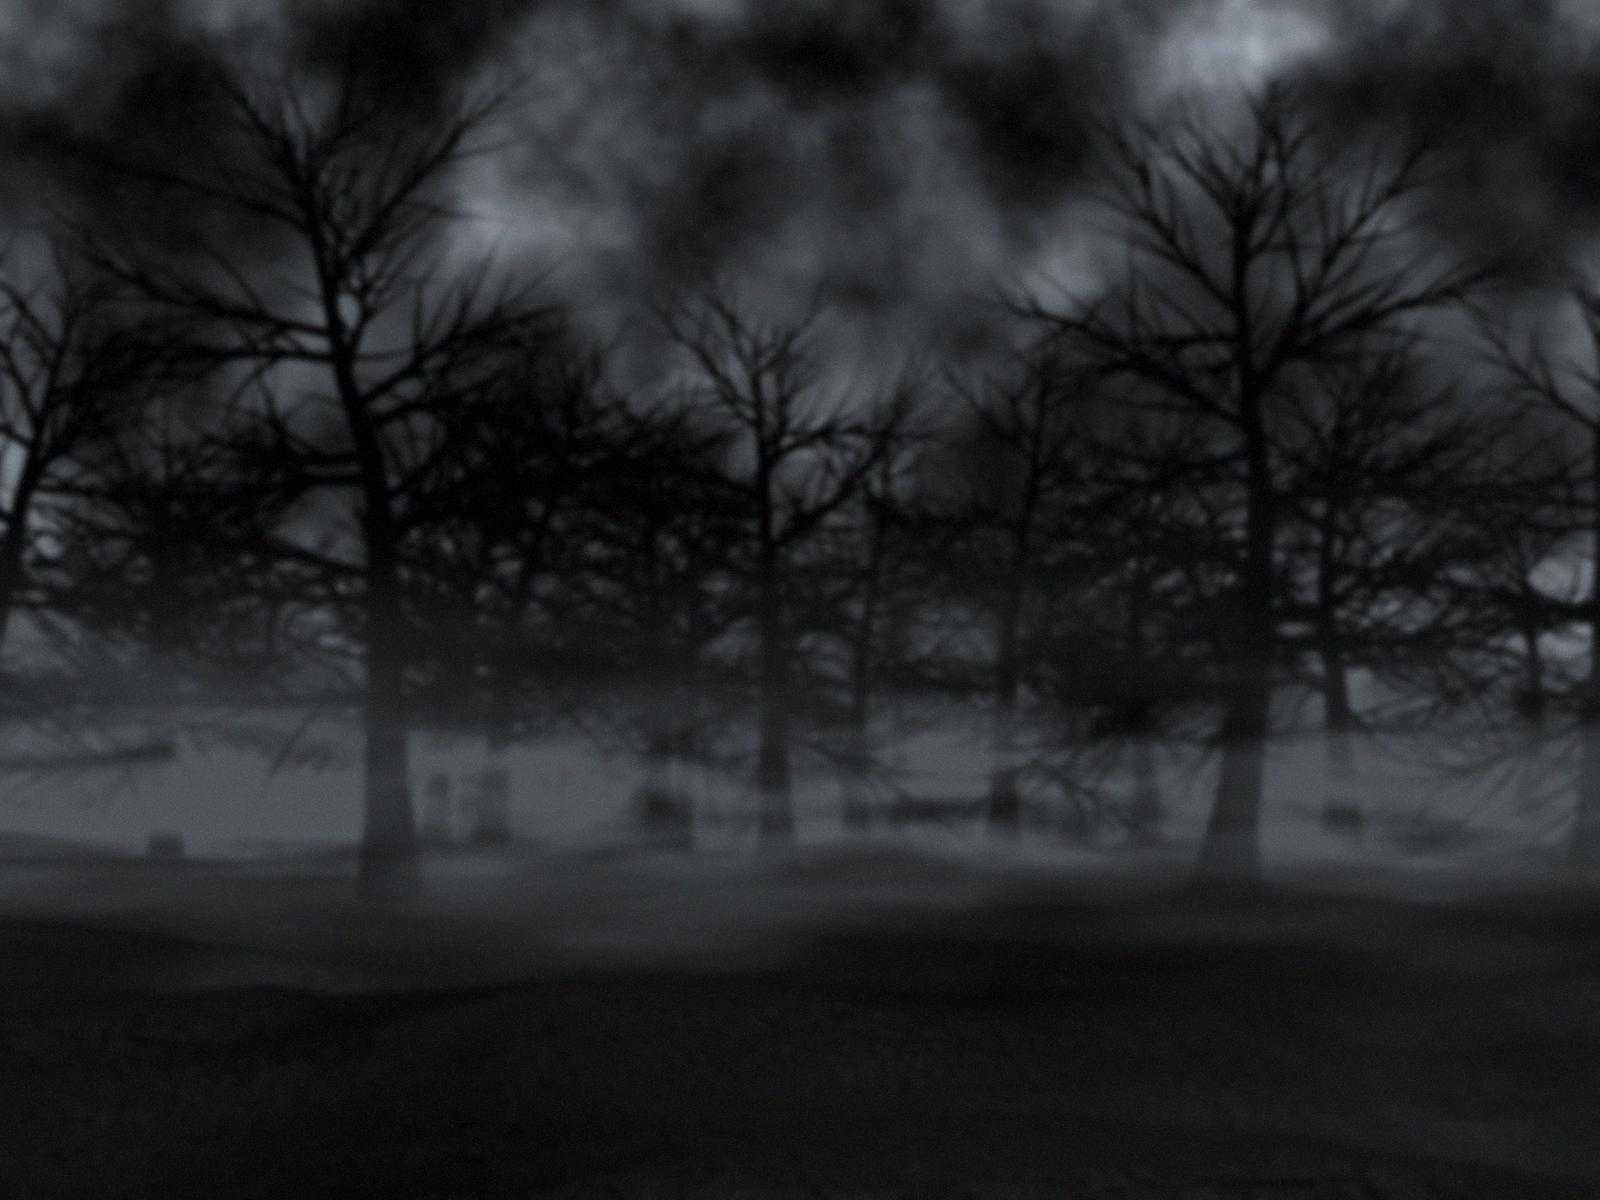 darkness-019